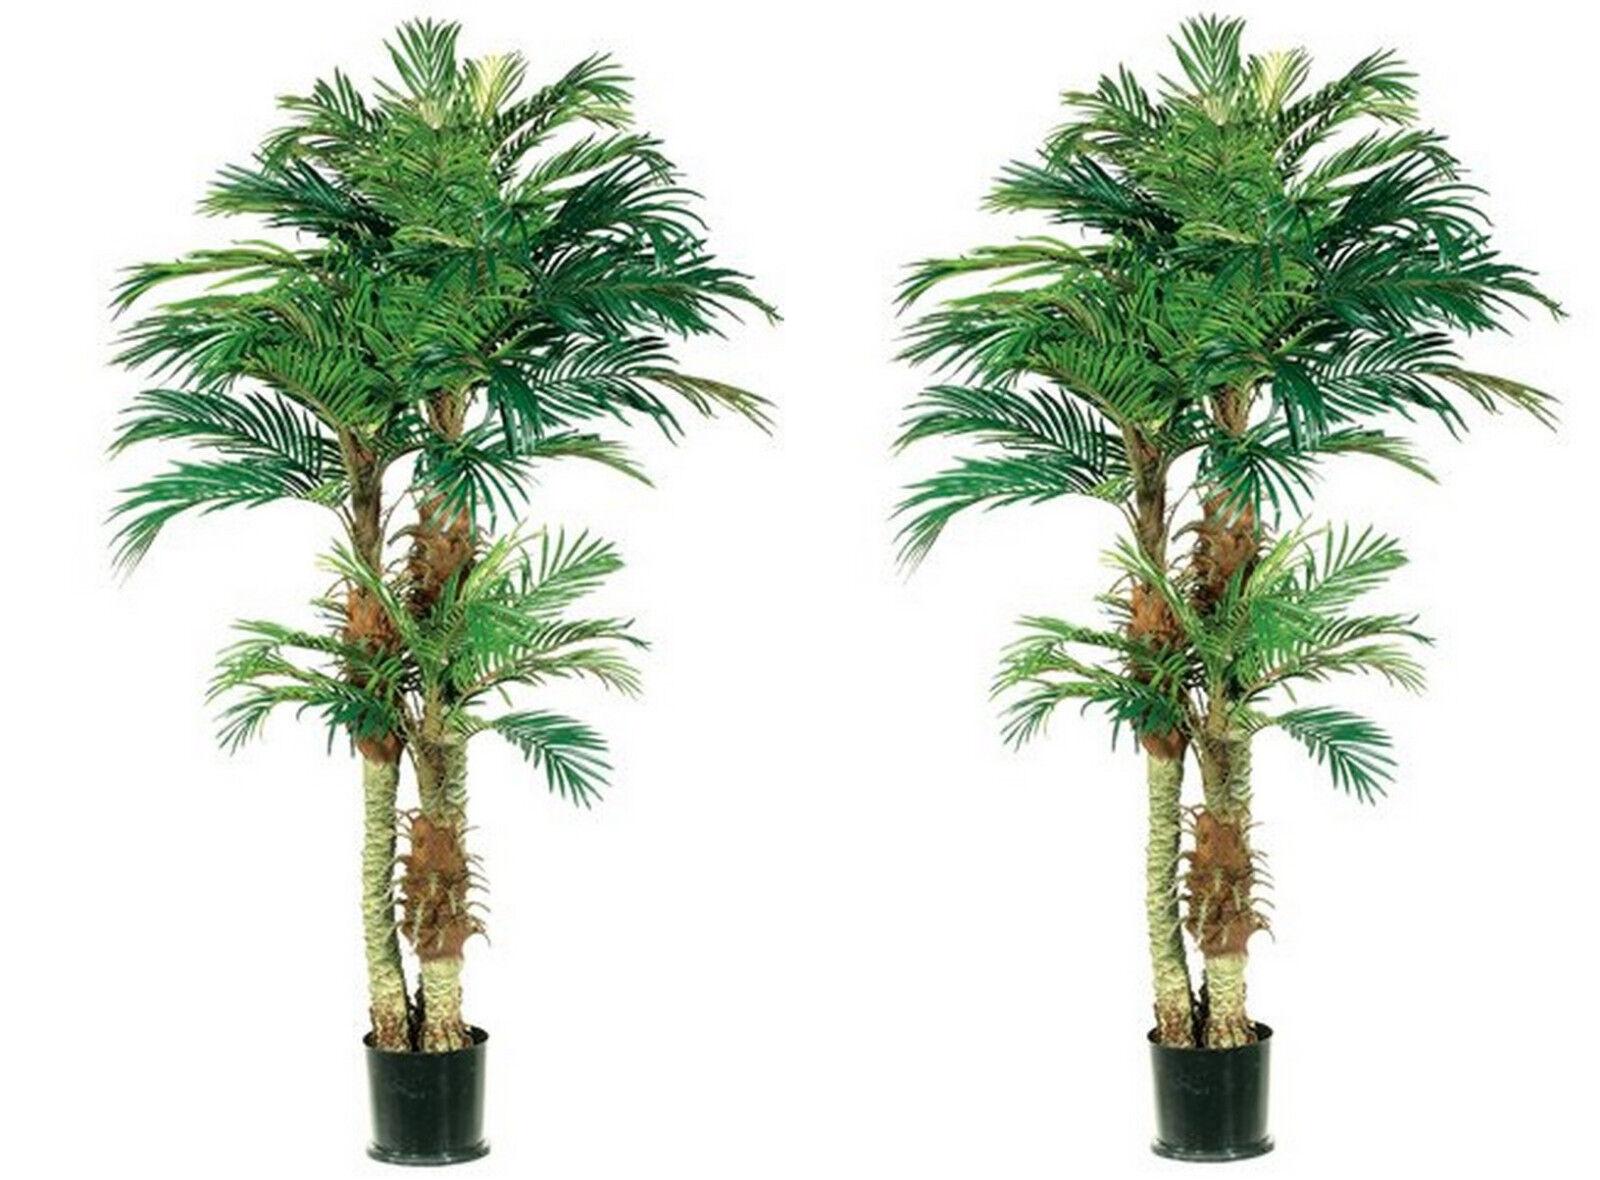 Two 6 foot Artificial Triple Trunk Phoenix Palm Trees Pot Areca 5 3 4 Date Pool